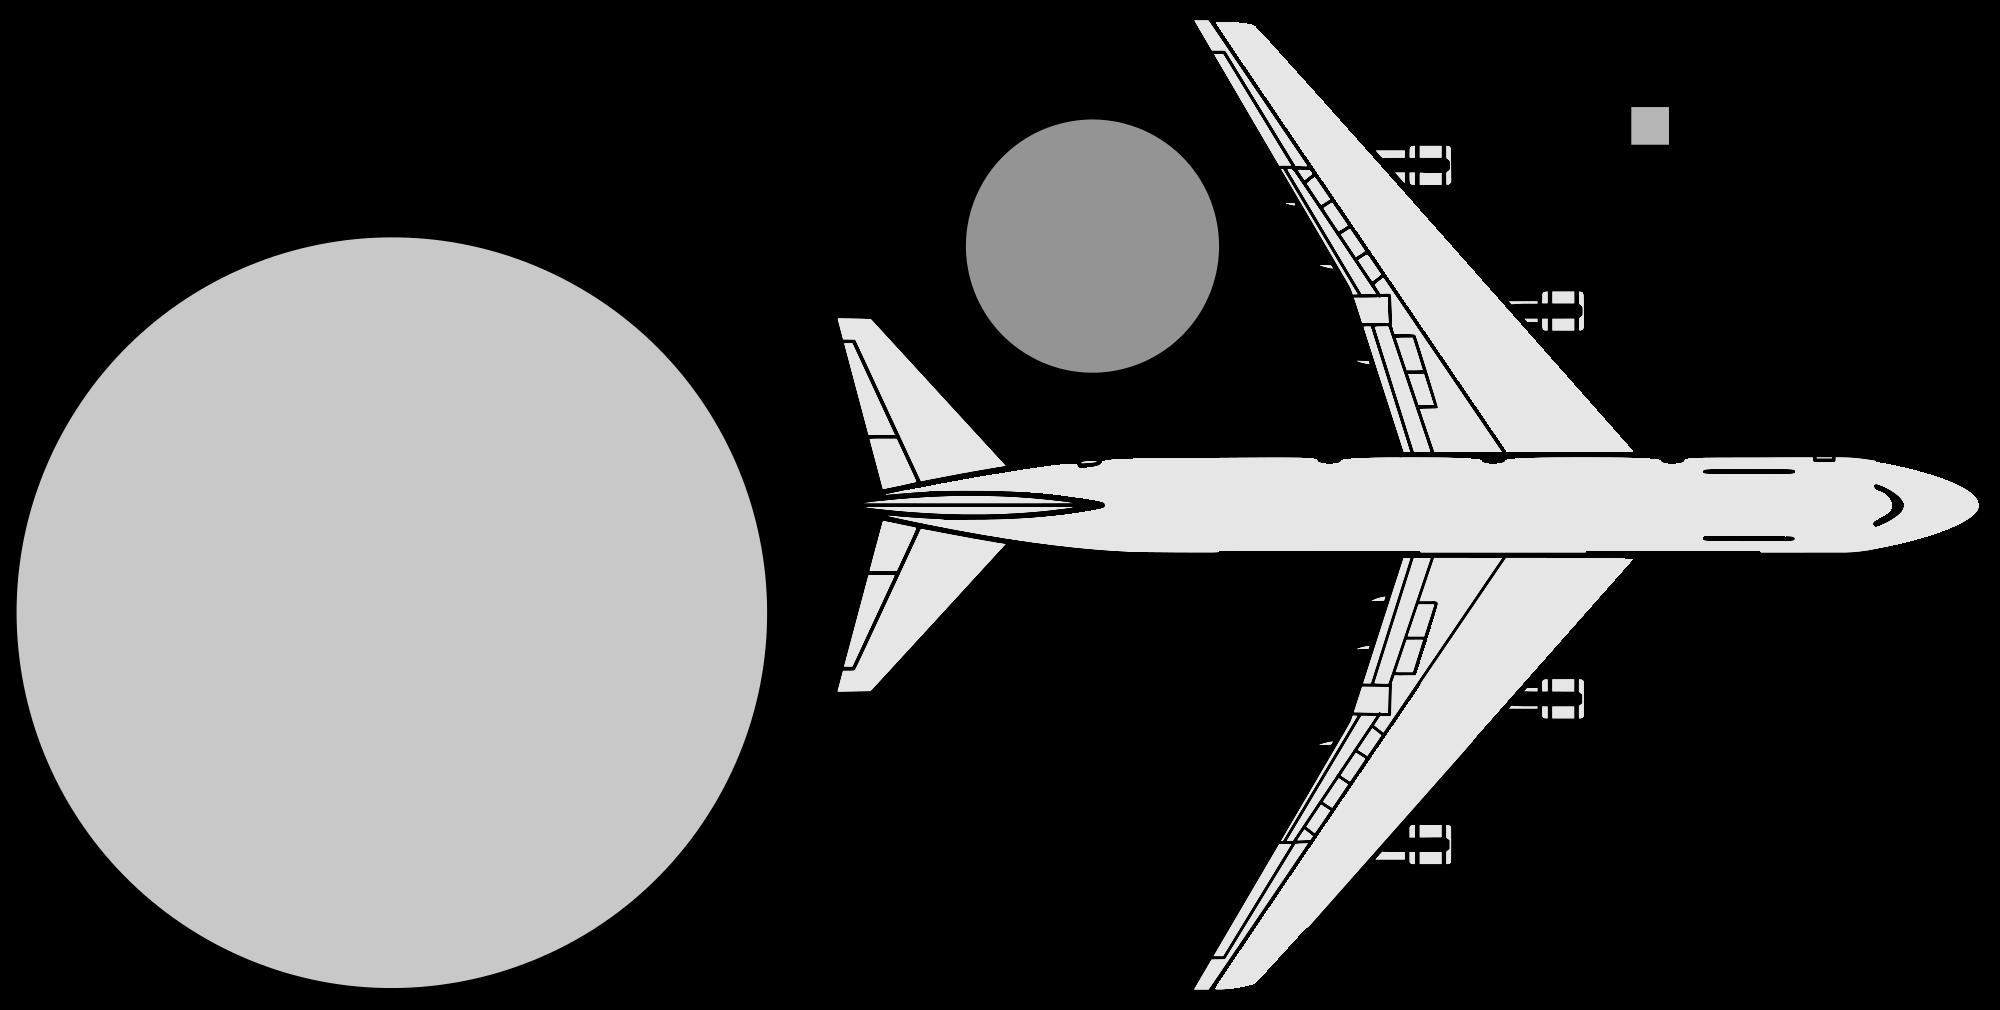 Meteor svg #19, Download drawings